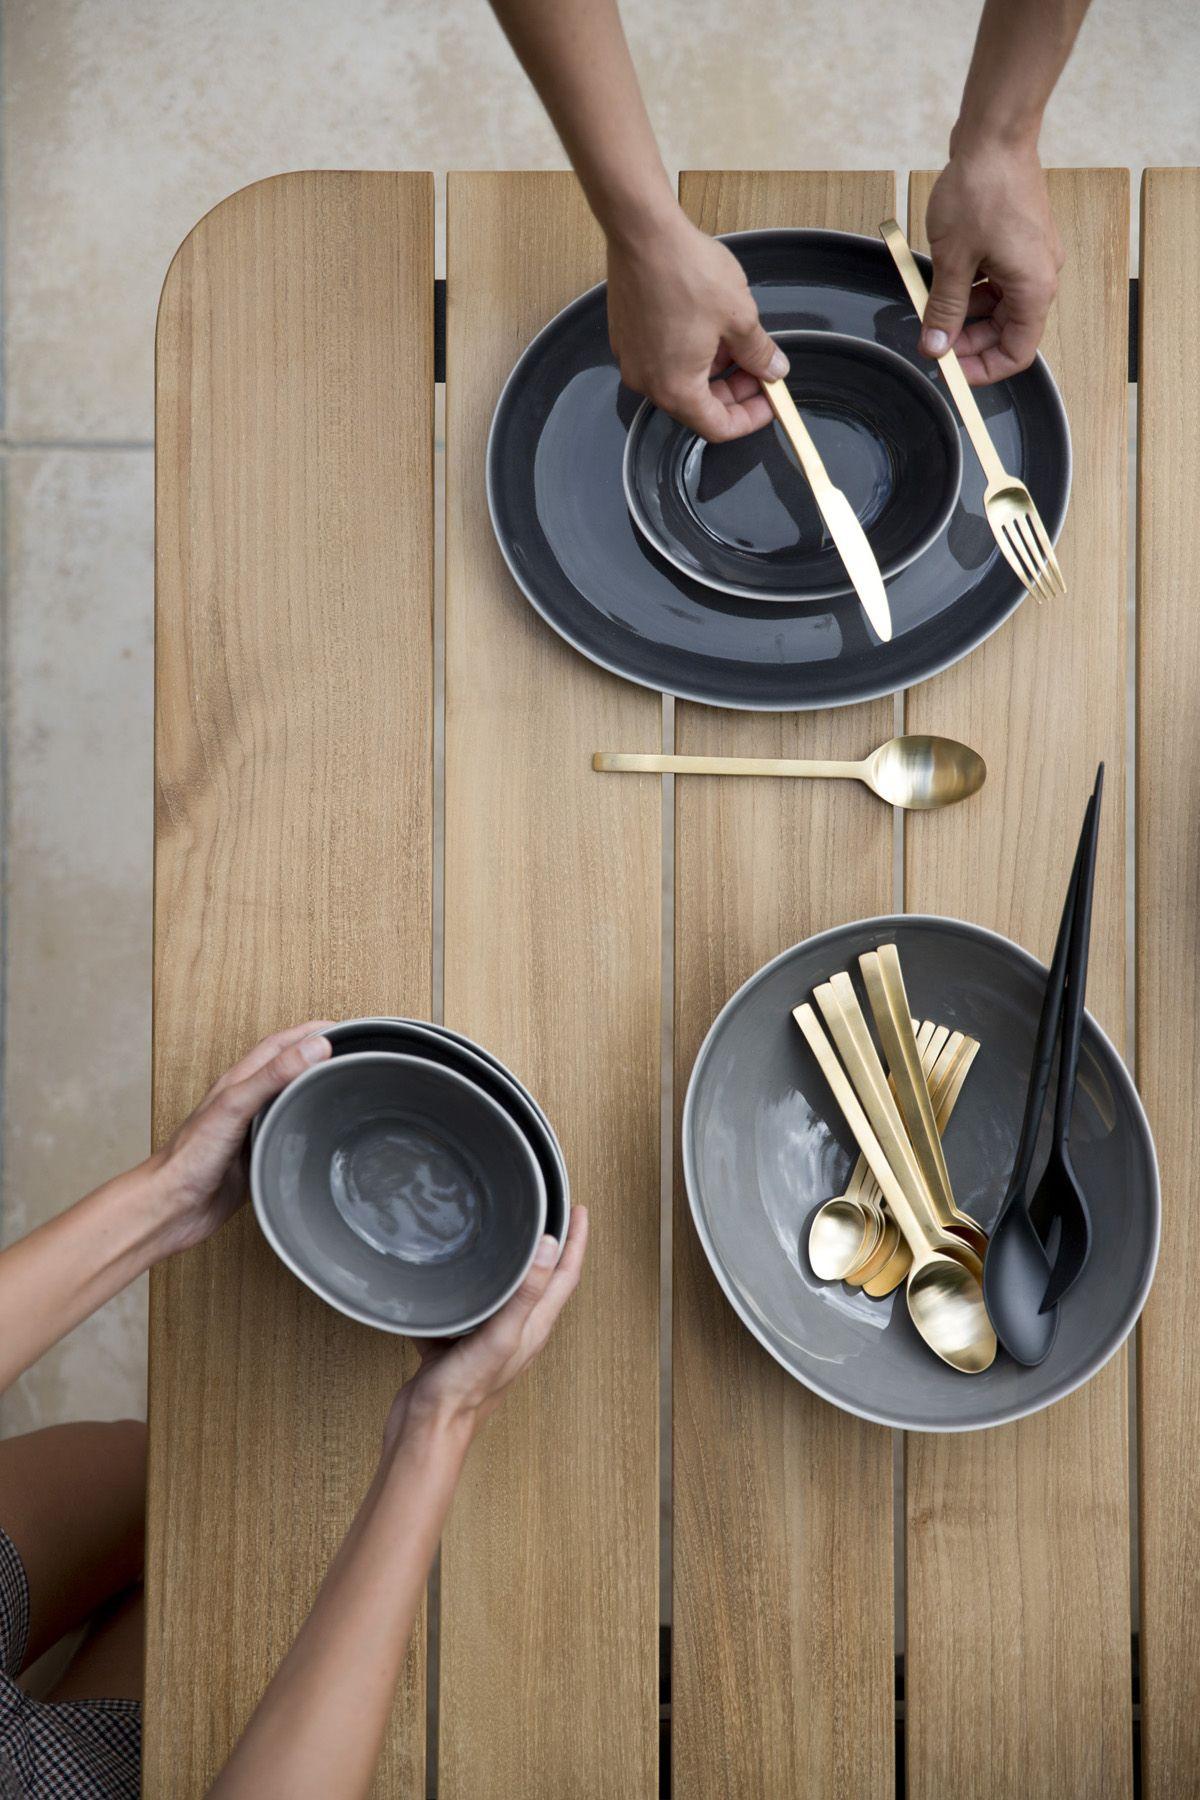 Core Garden Table By Cane Line Design Foersom Hiort Lorenzen